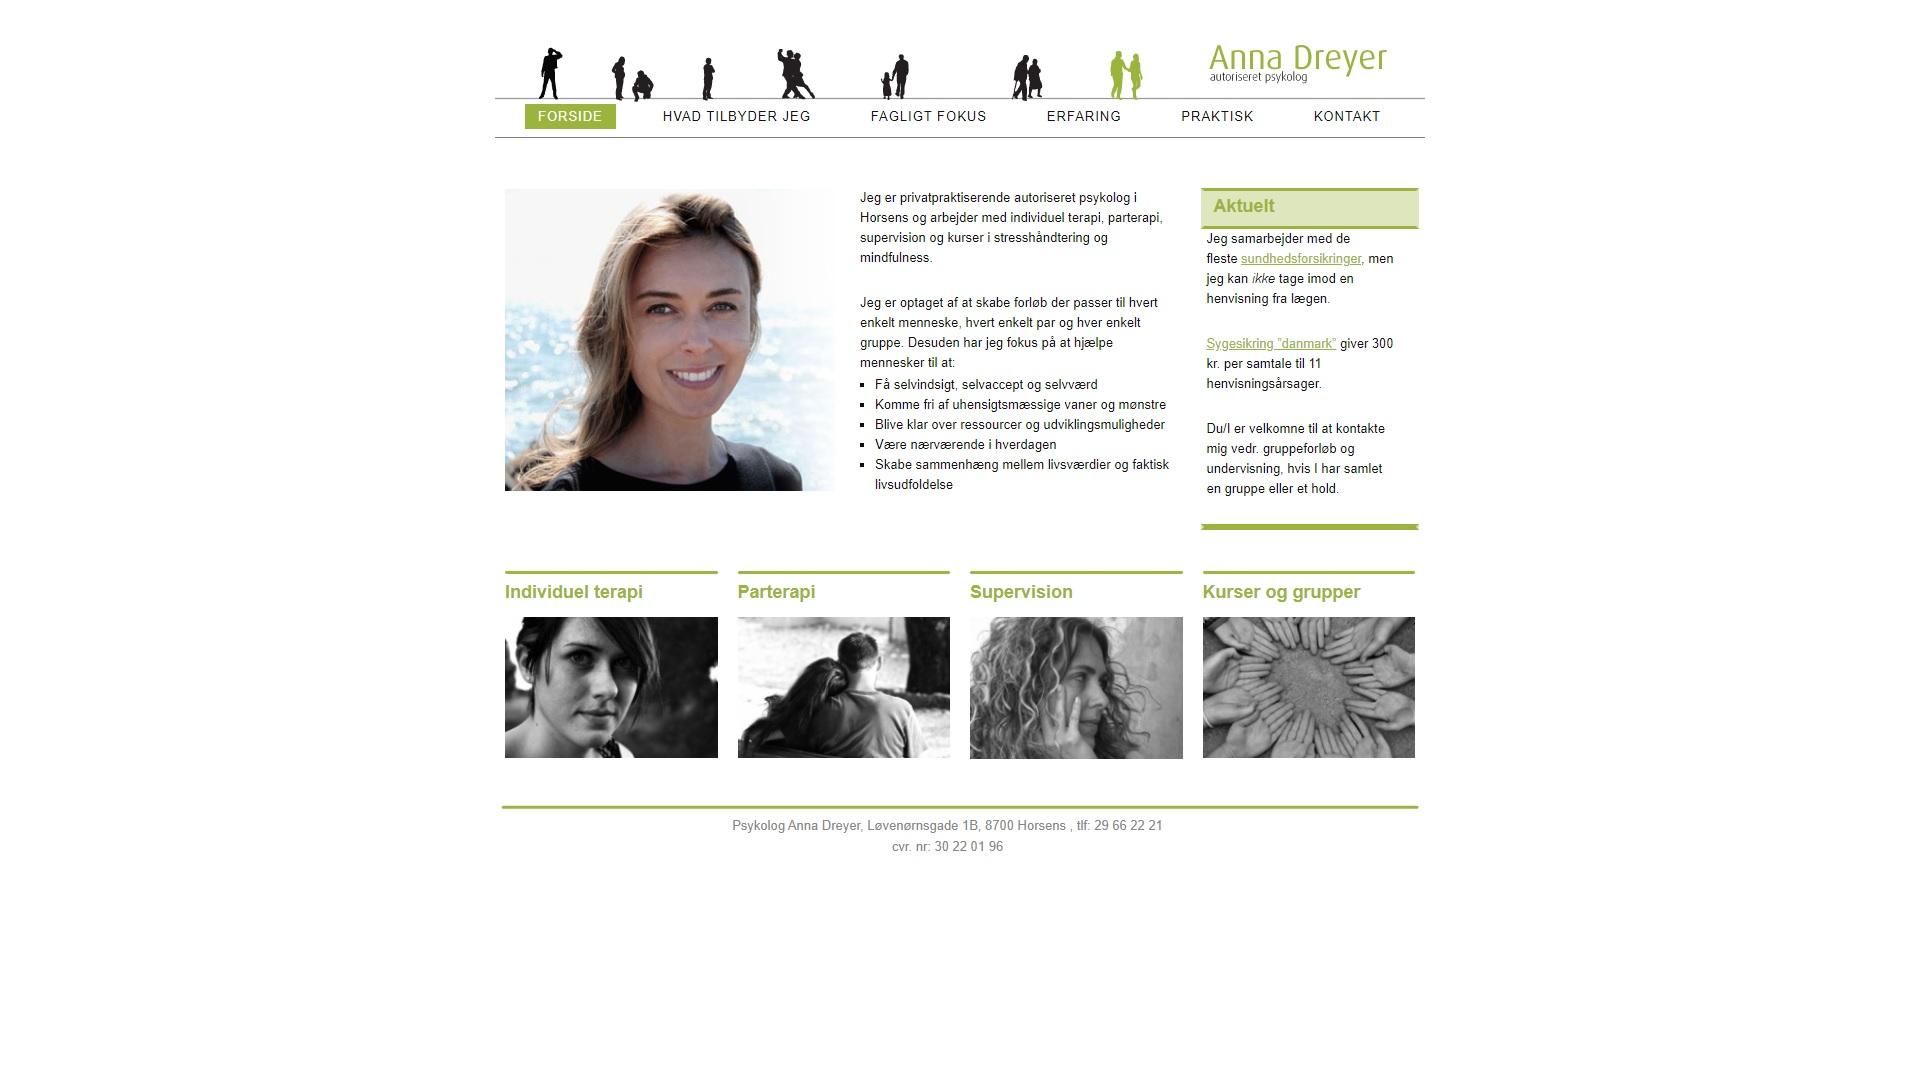 Psykolog Anna Dreyer